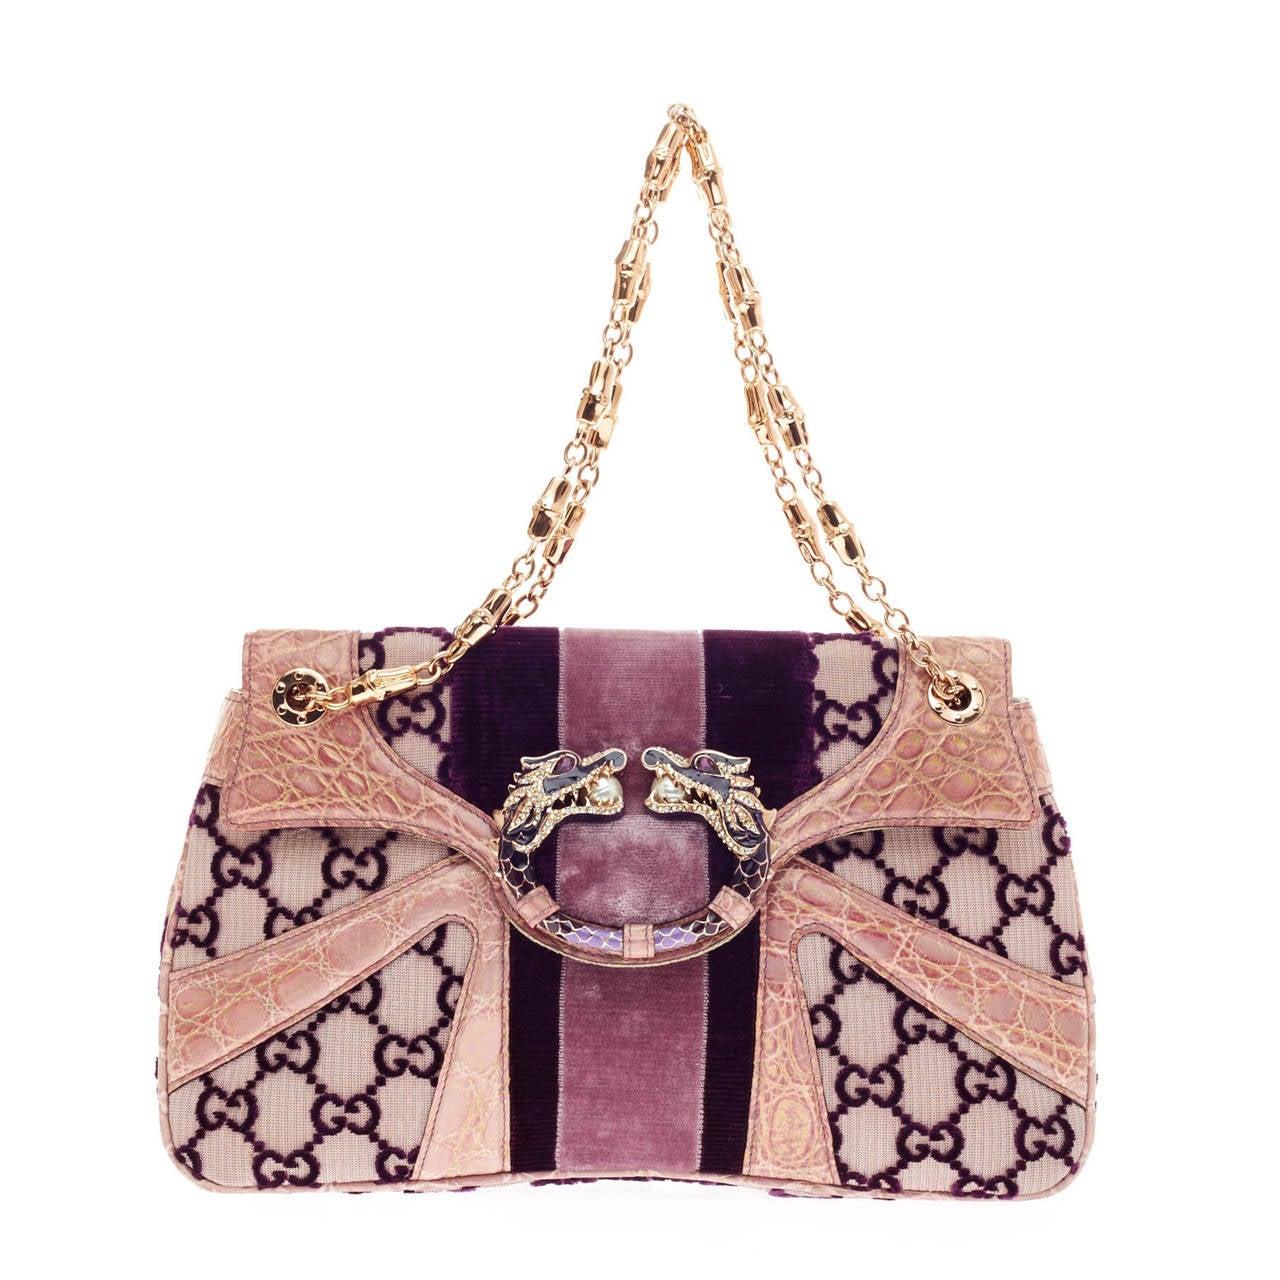 72320648d9b Gucci Jeweled Dragon Bag Velvet Monogram at 1stdibs